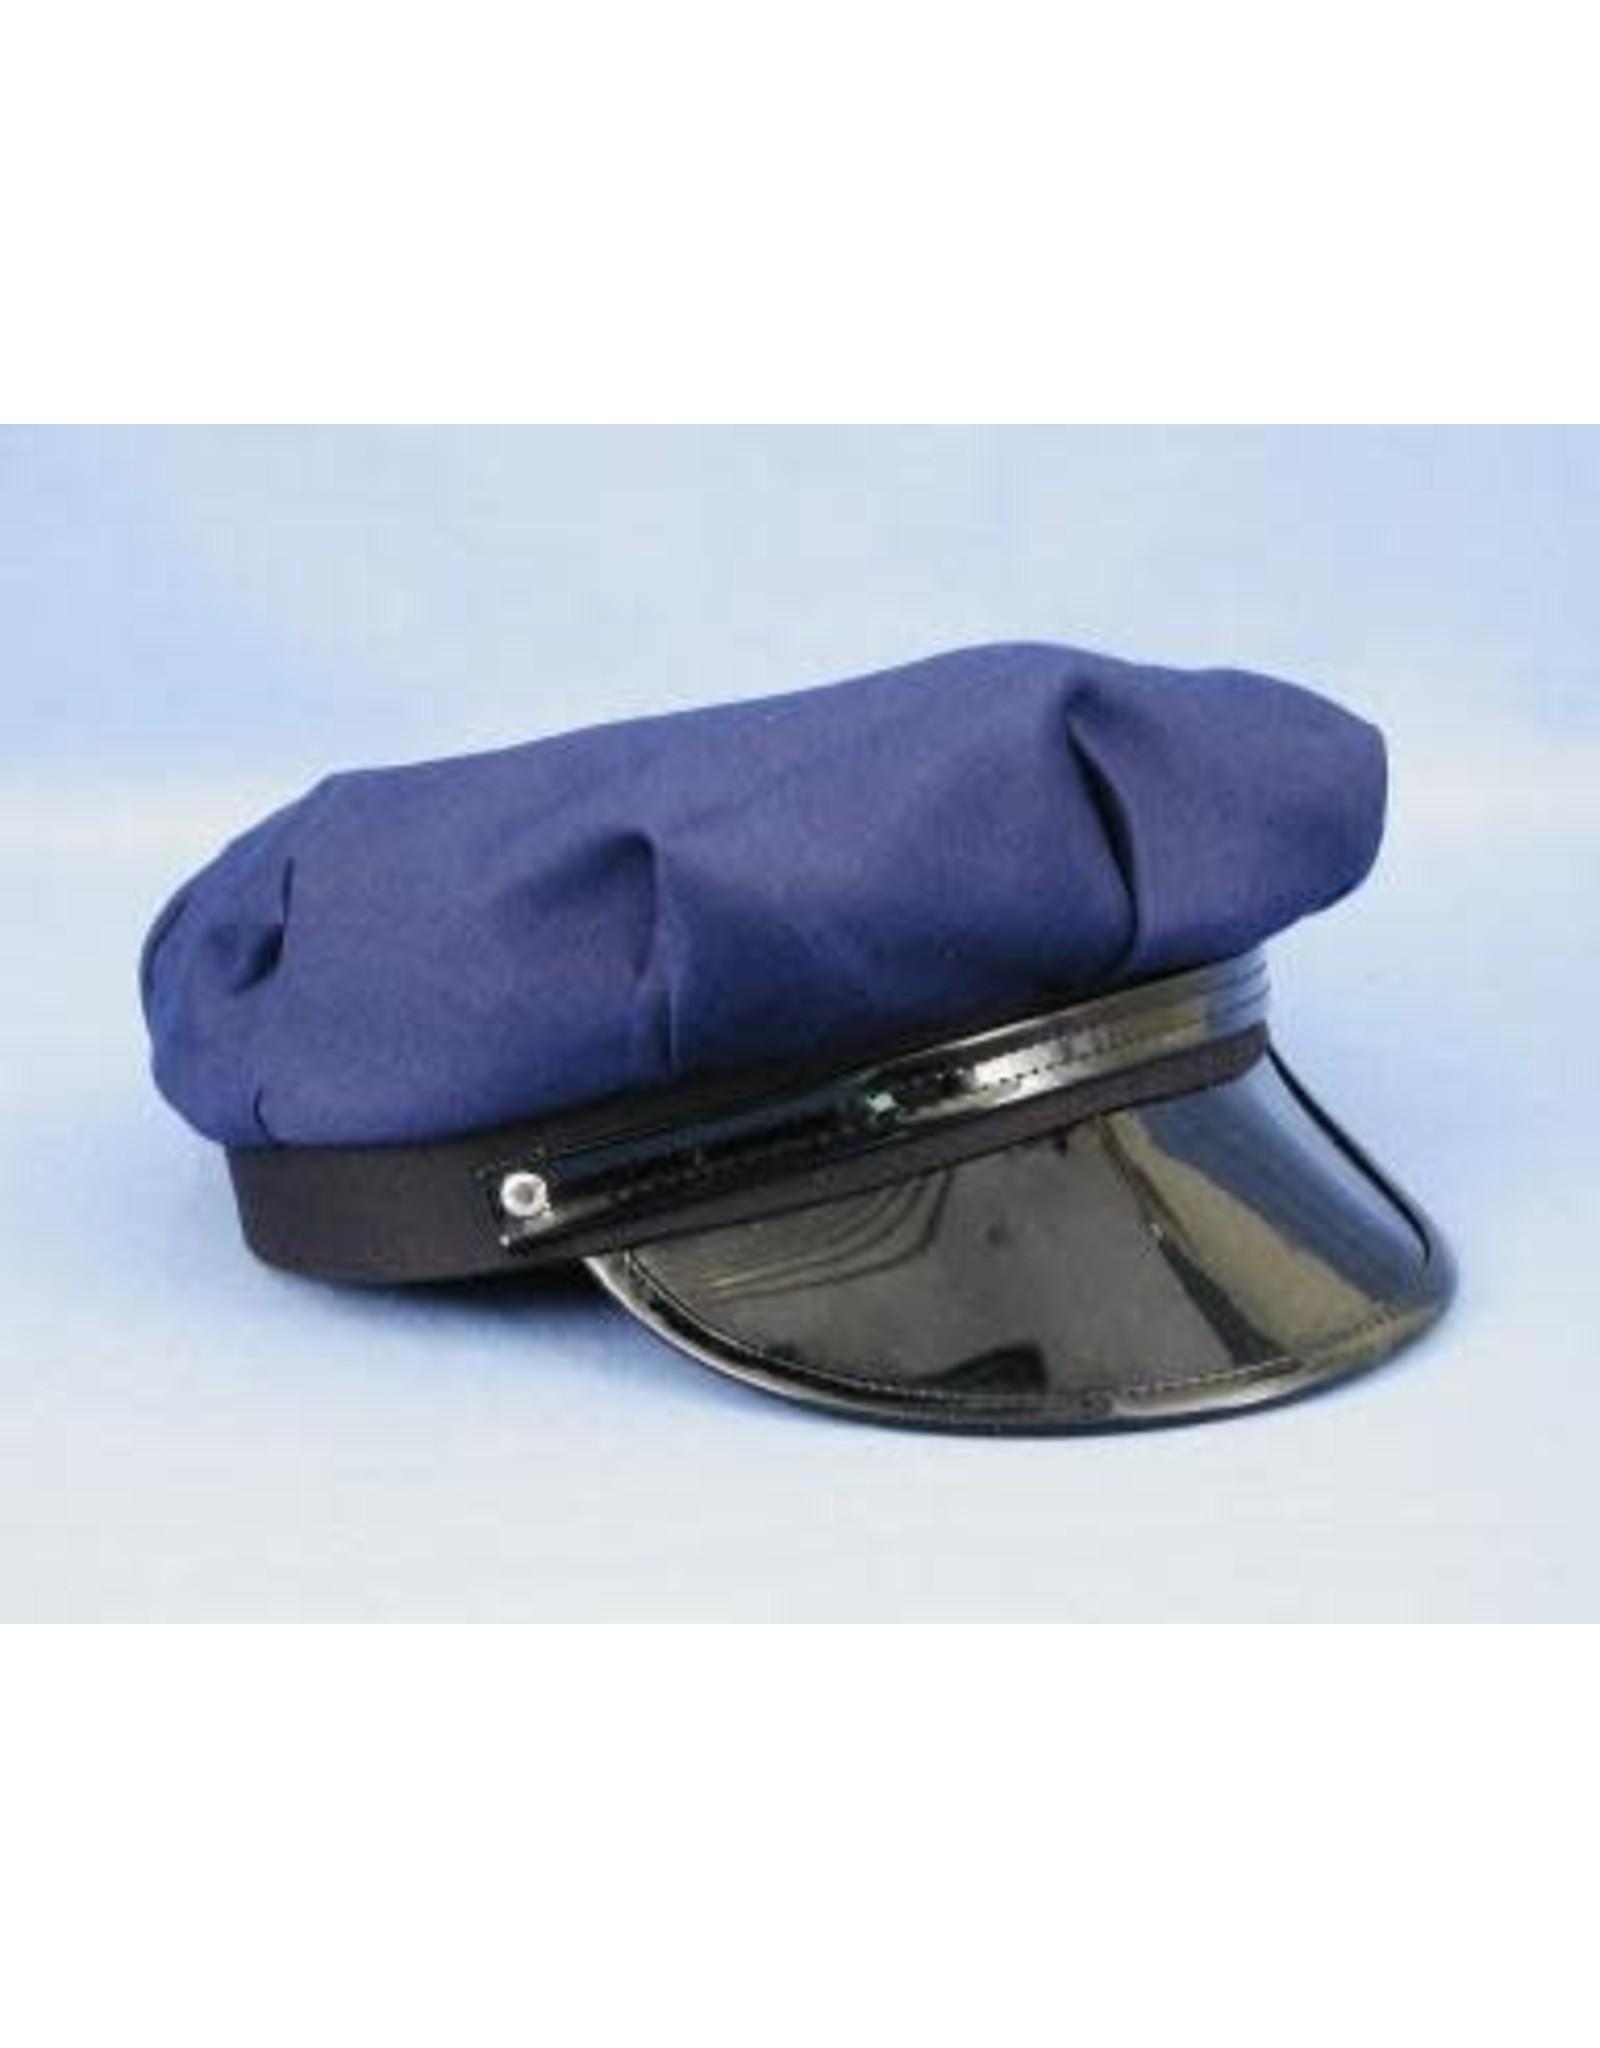 HM Smallwares Blue Police/Chauffeur Hat